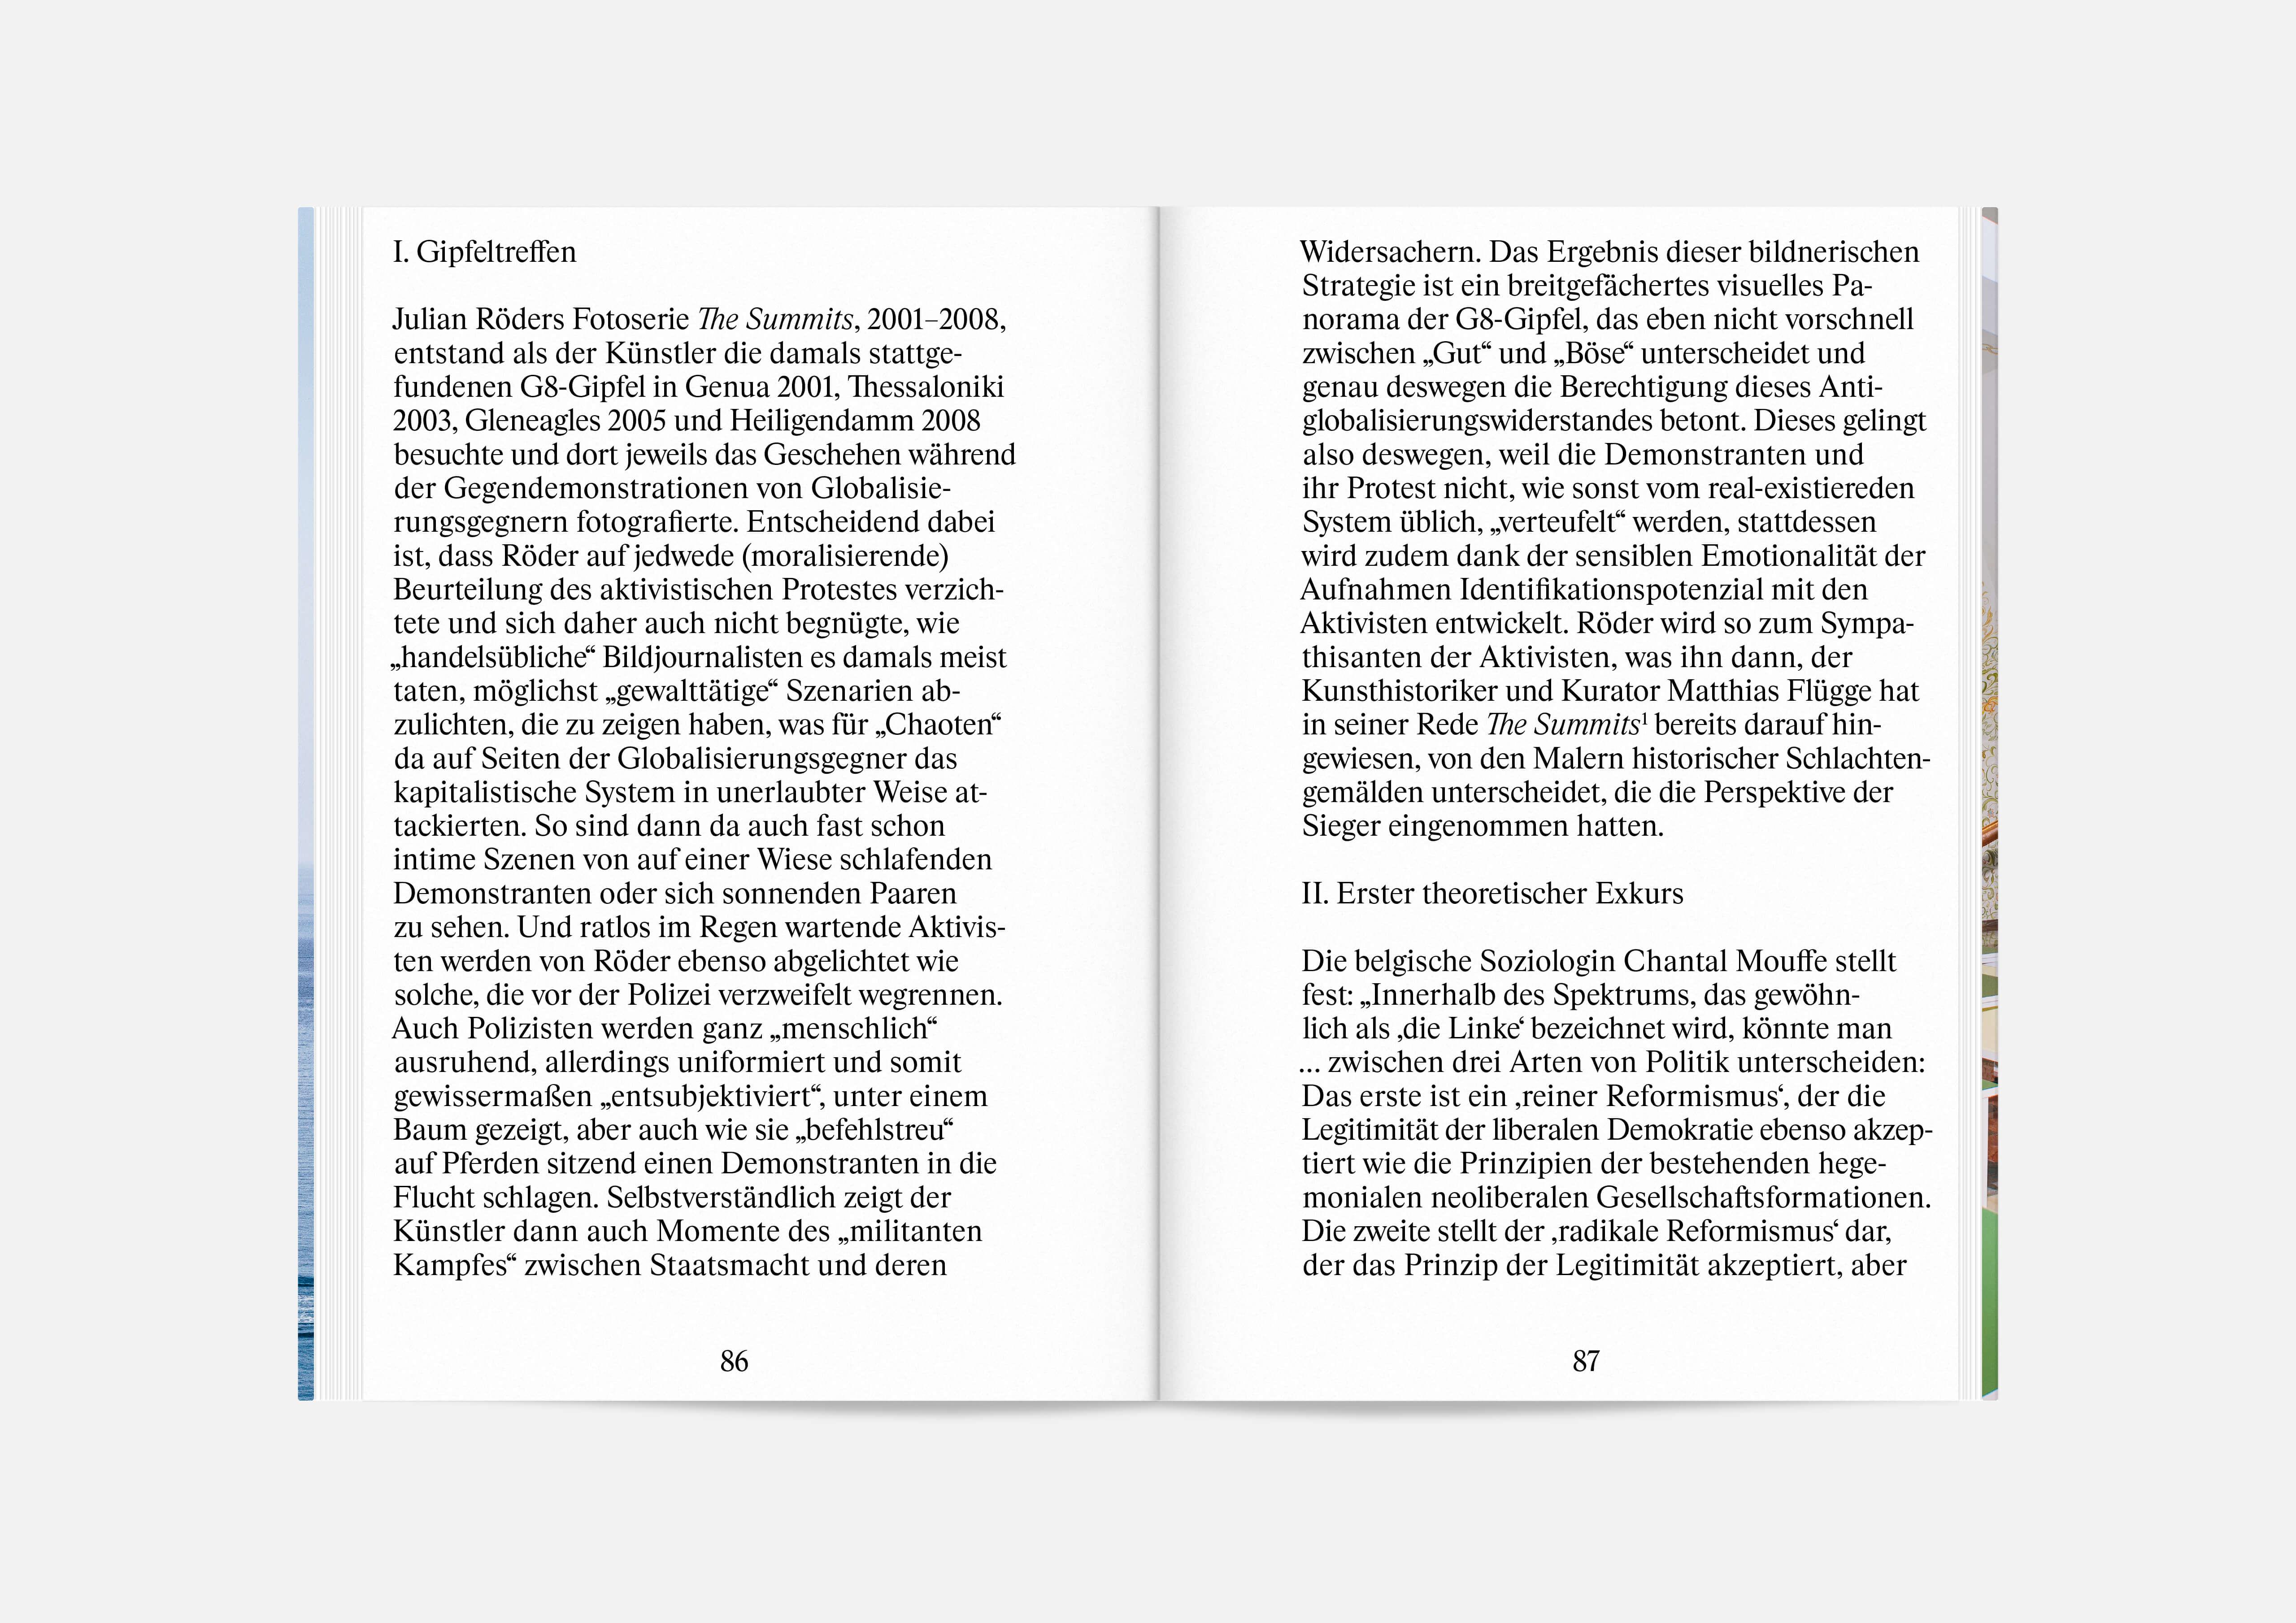 https://neuegestaltung.de/media/pages/clients/julian-roeder/626b25faab-1610896617/jr-glauben_18.jpg